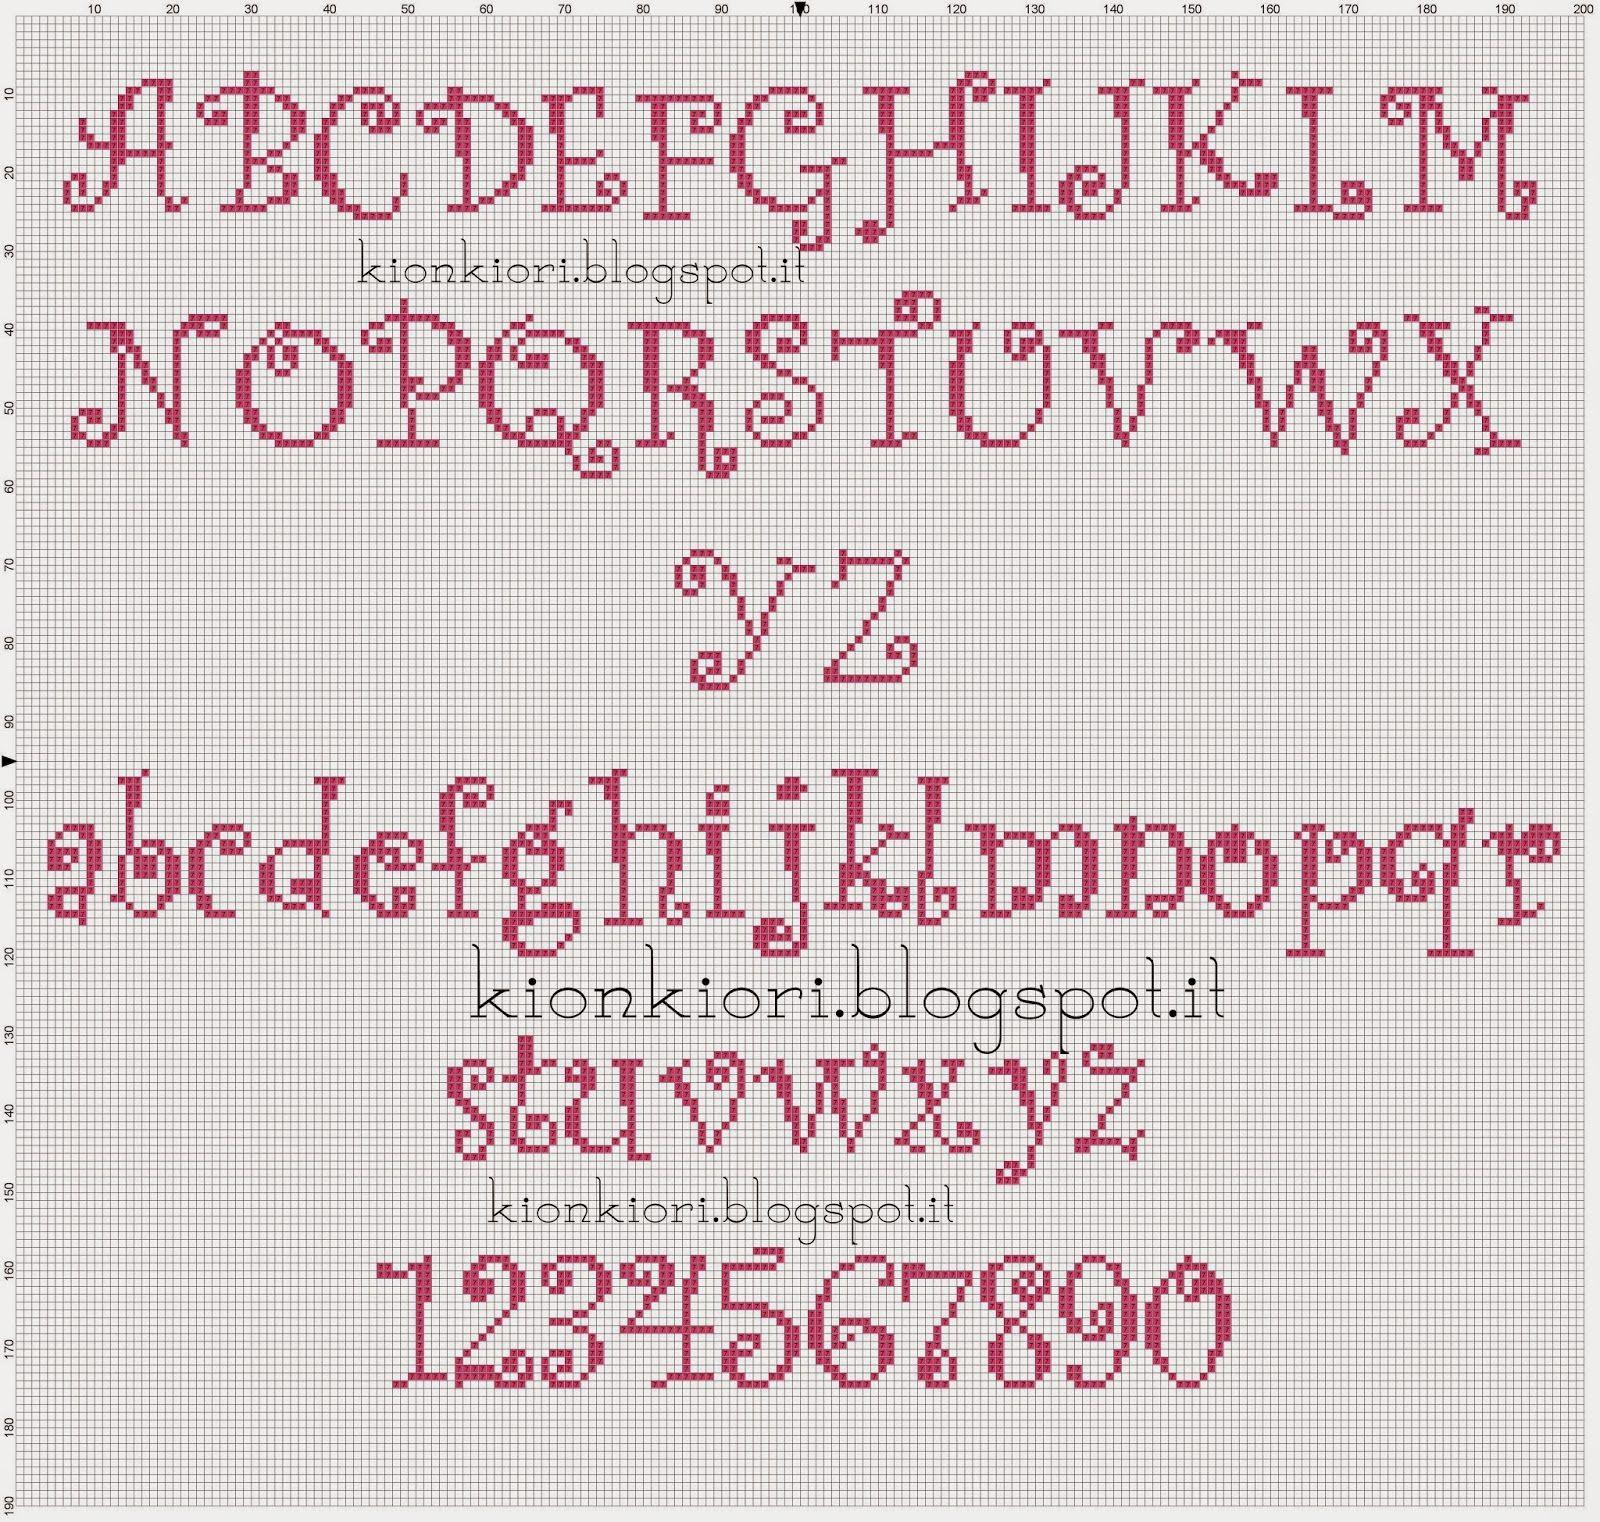 Alfabeto curlz mt completo h30 cs alphabet 3 alfabeto for Alfabeto a punto croce per neonati